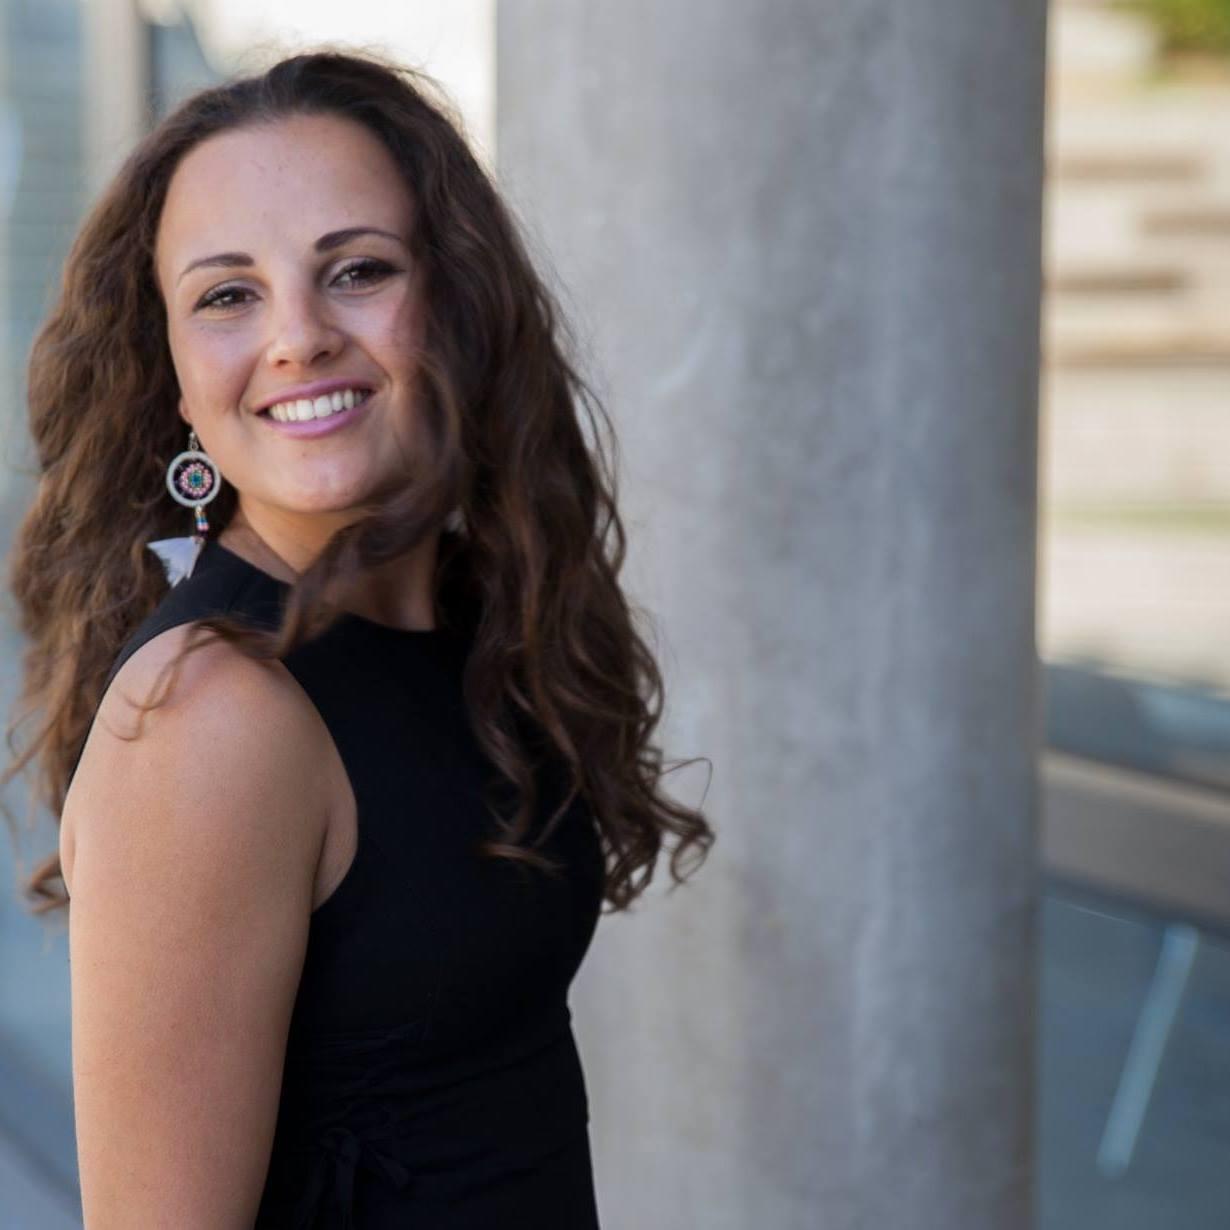 Claire Millward (University of Cape Town)